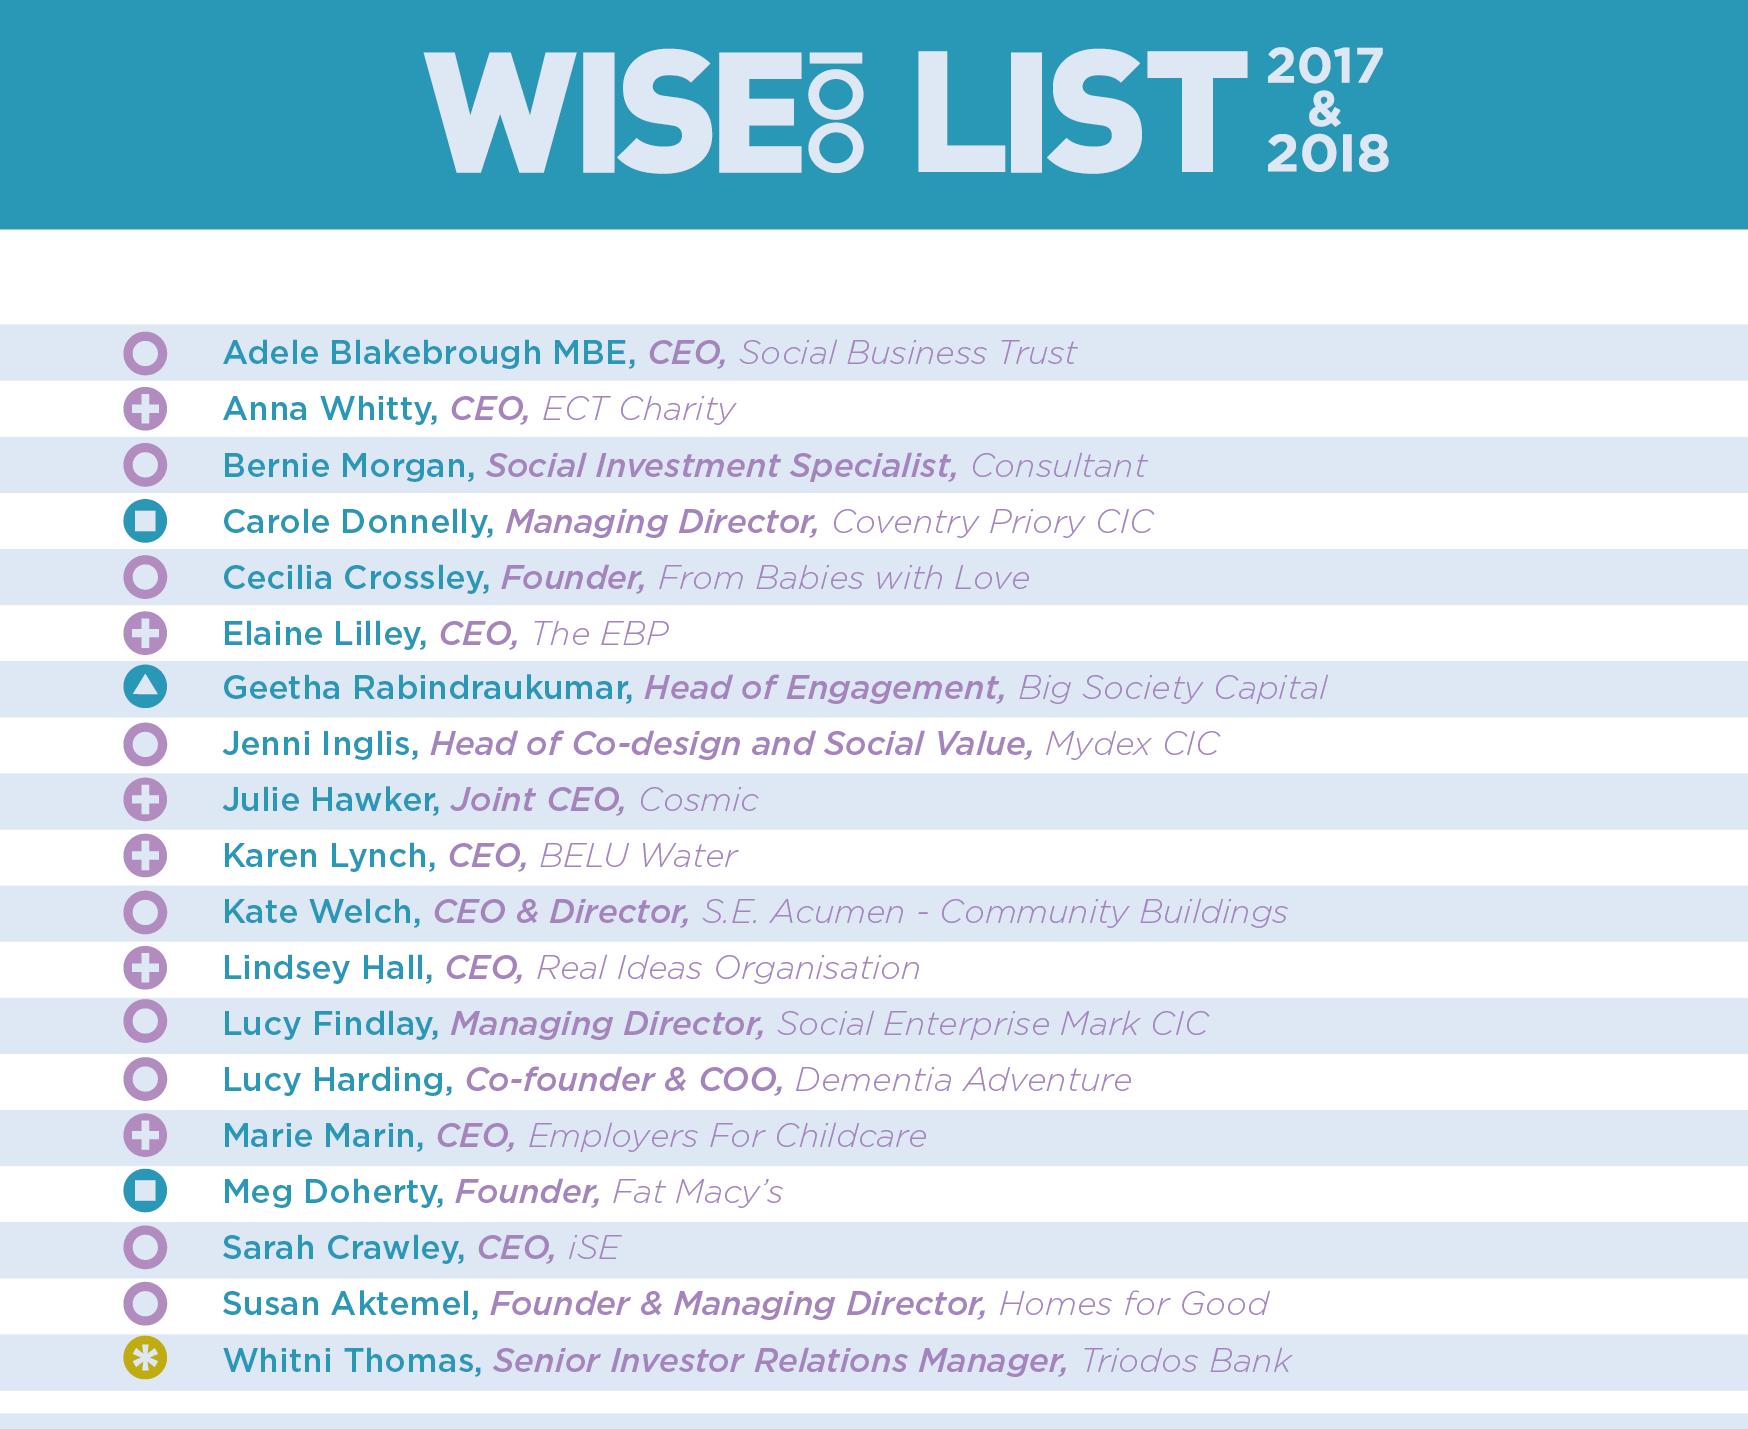 WISE100 2017 + 2018 list